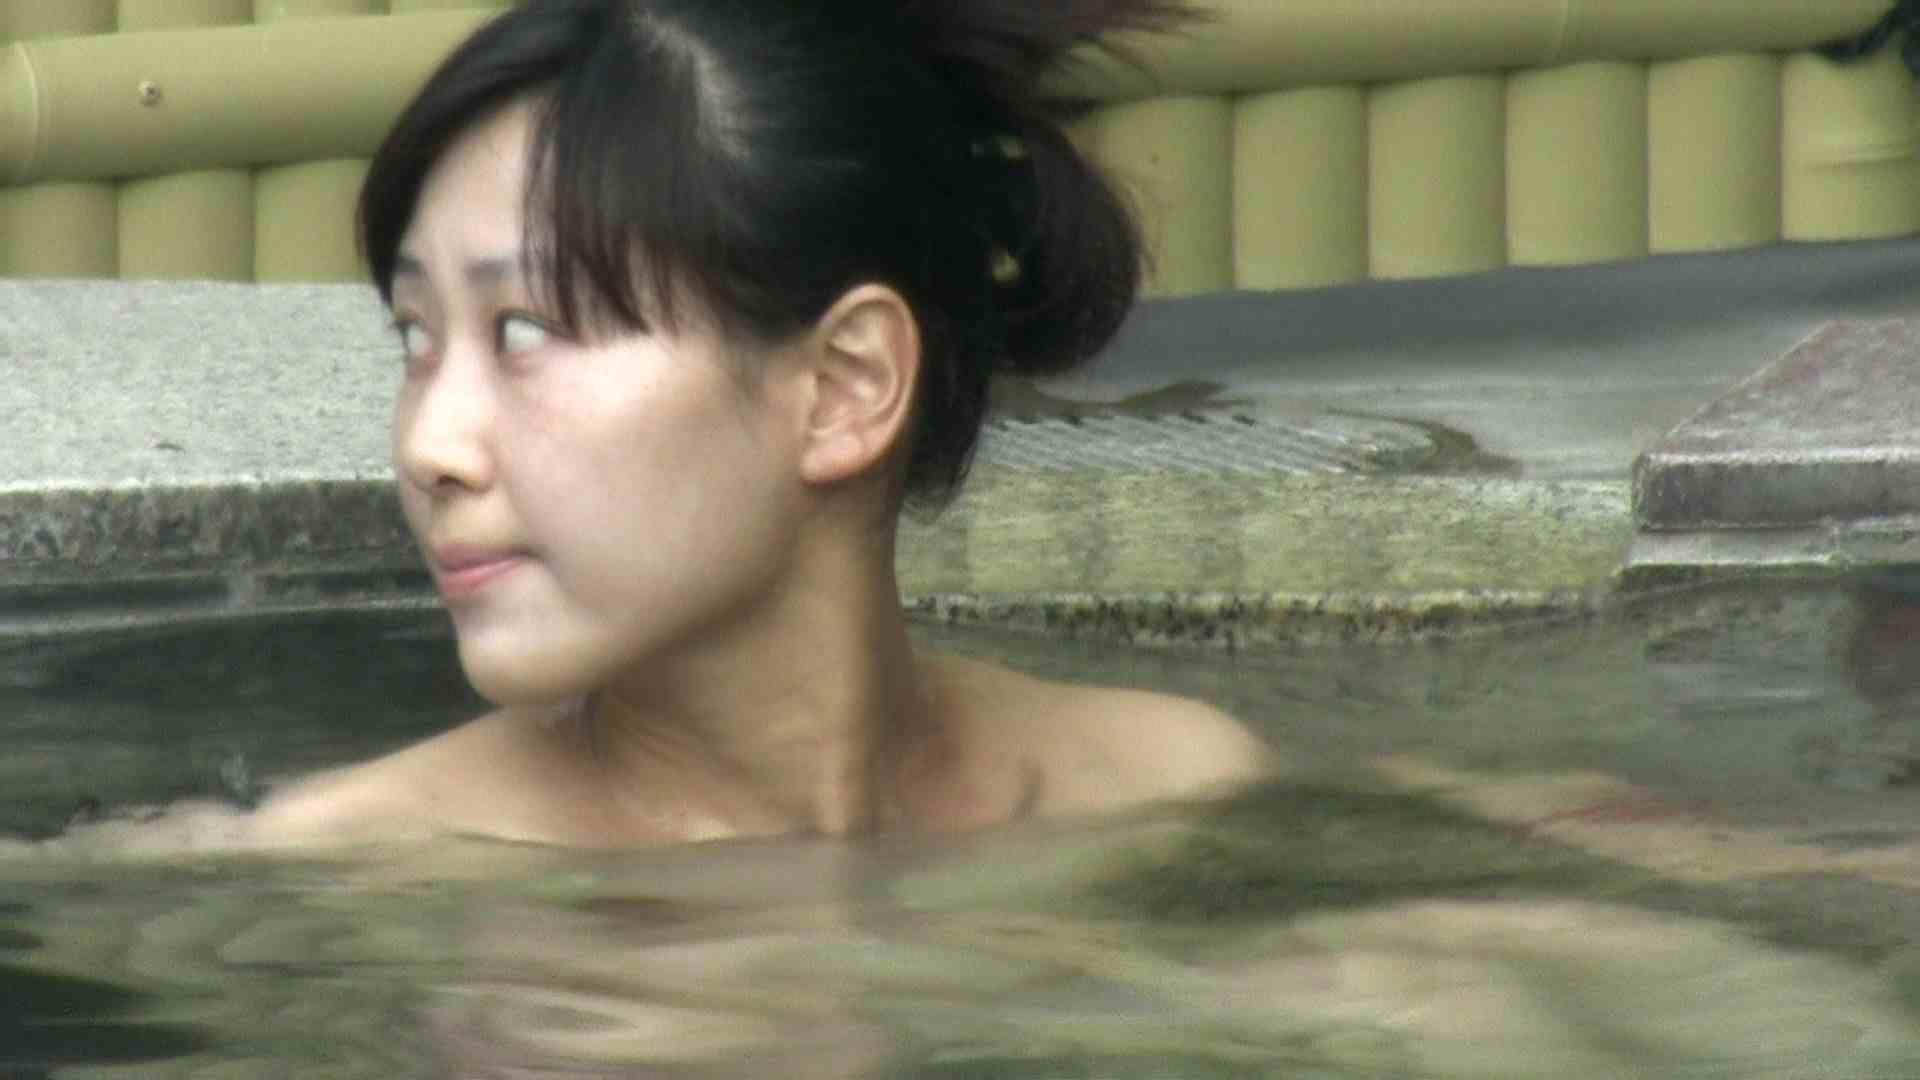 Aquaな露天風呂Vol.665 露天 アダルト動画キャプチャ 85枚 44